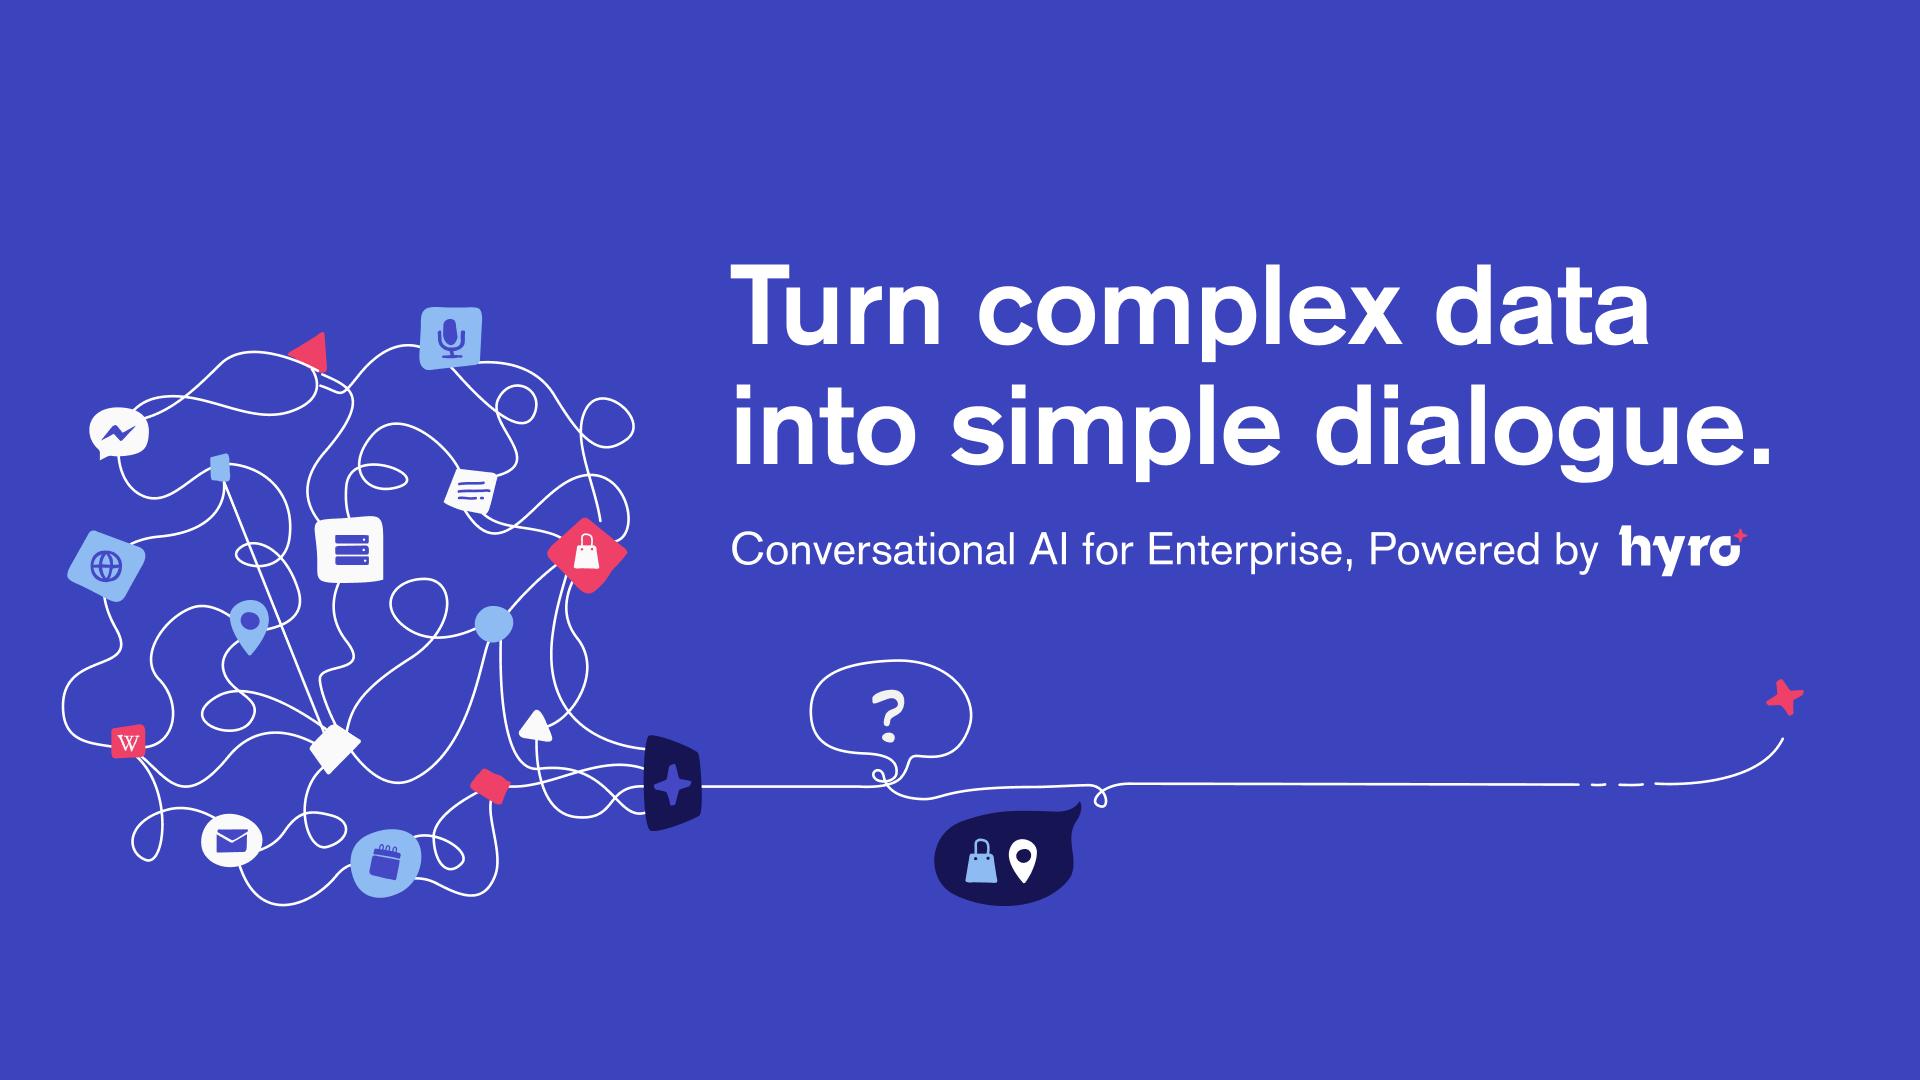 Hyro - Conversational AI for enterprise